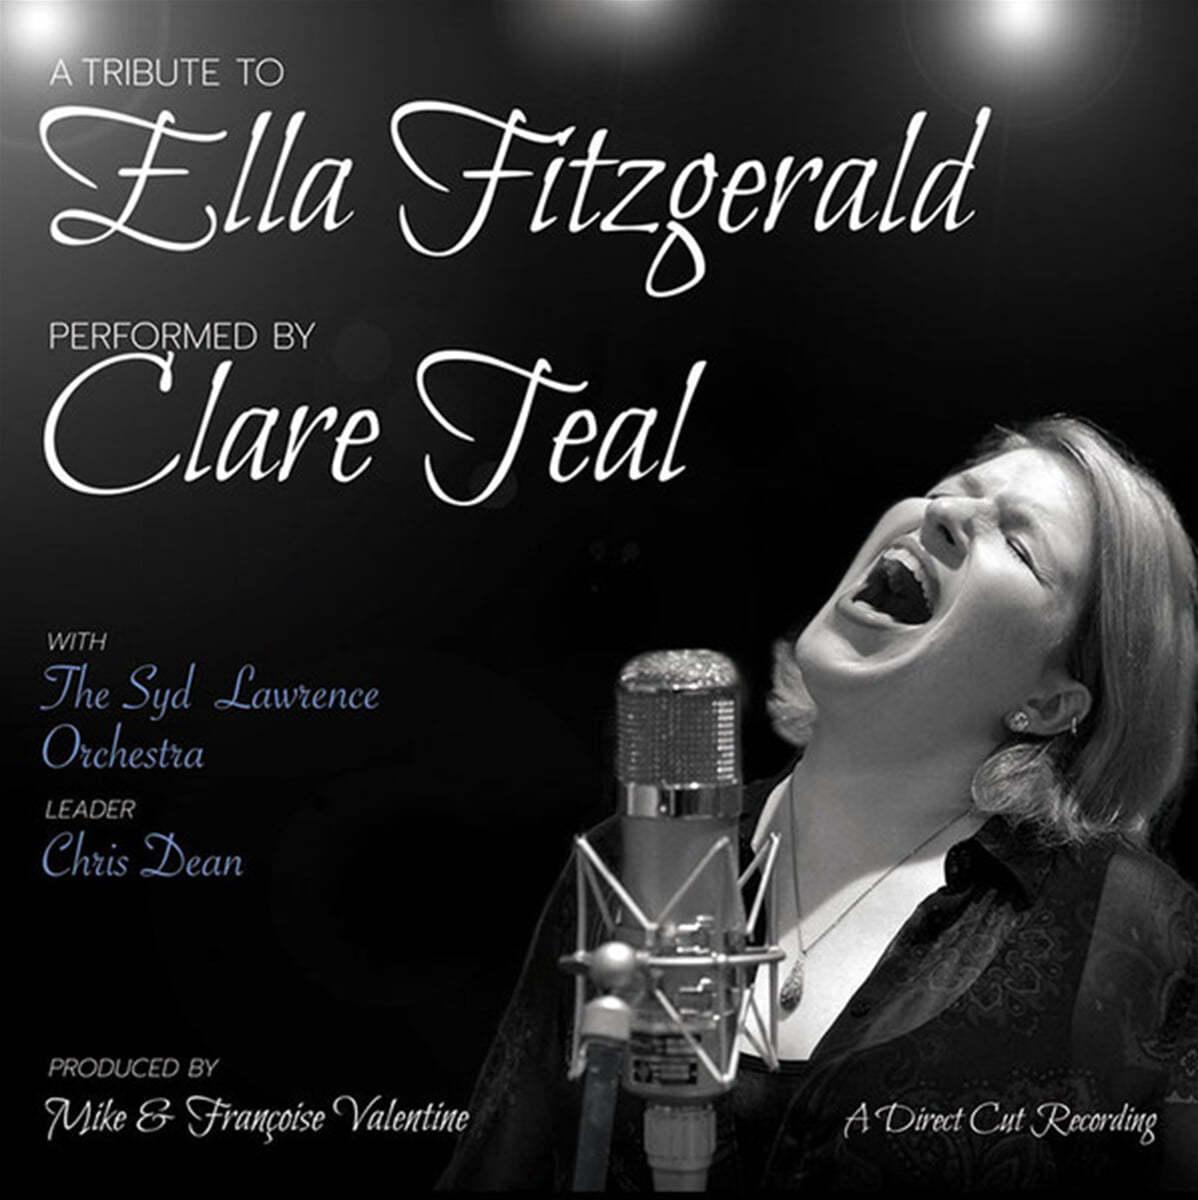 Clare Teal 엘라 피츠제럴드 헌정음악 (A Tribute To Ella Fitzgerald) [LP]